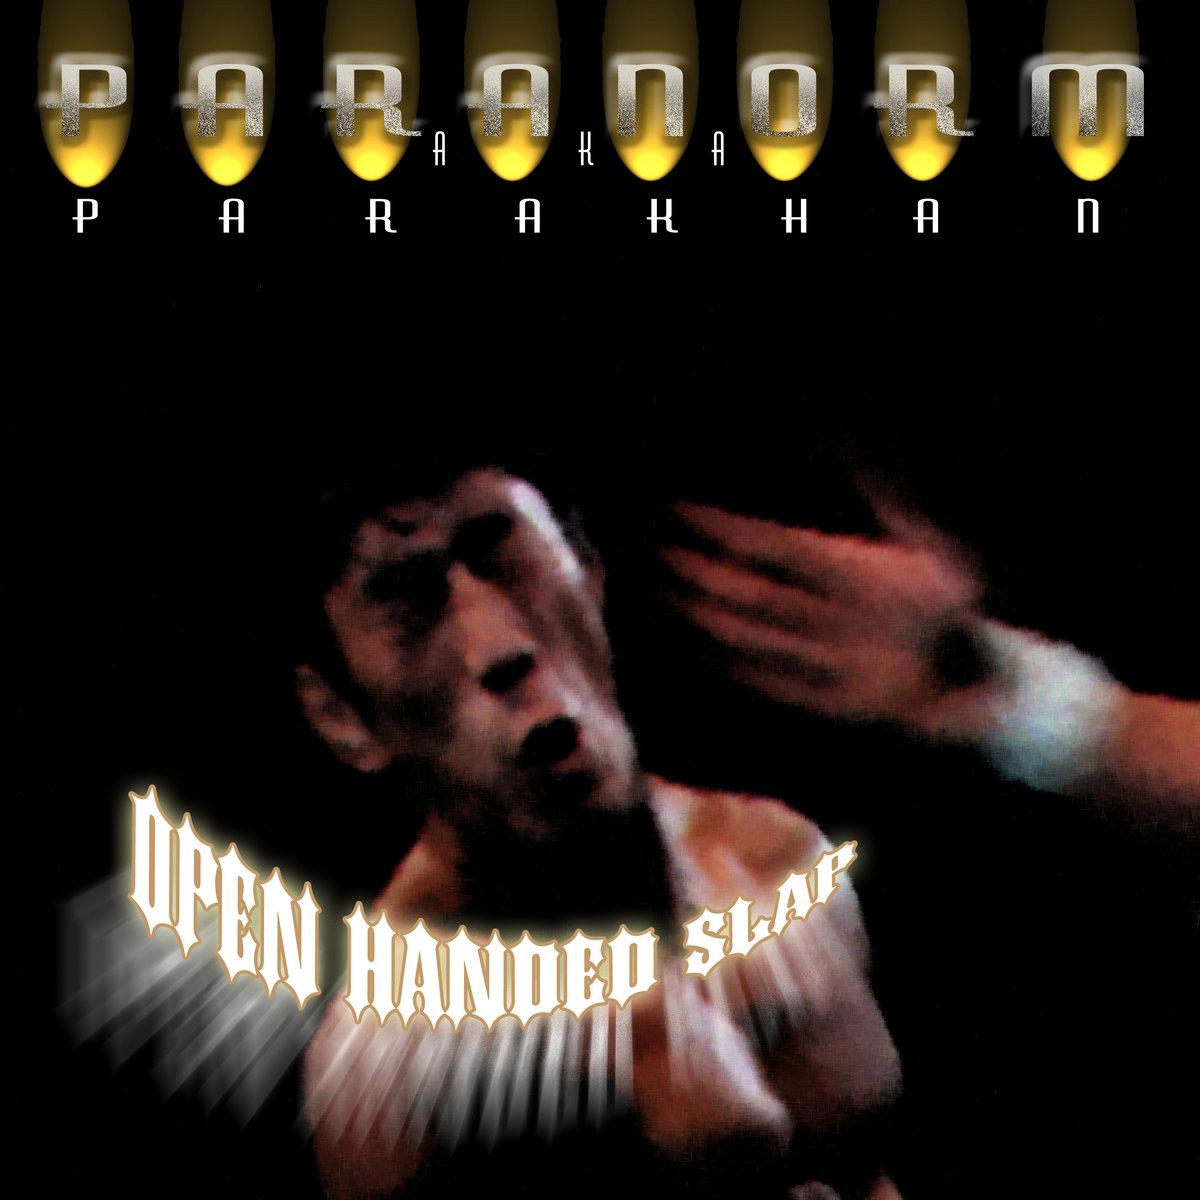 Paranorm - Open Handed Slap   Paranorm   Parakhan